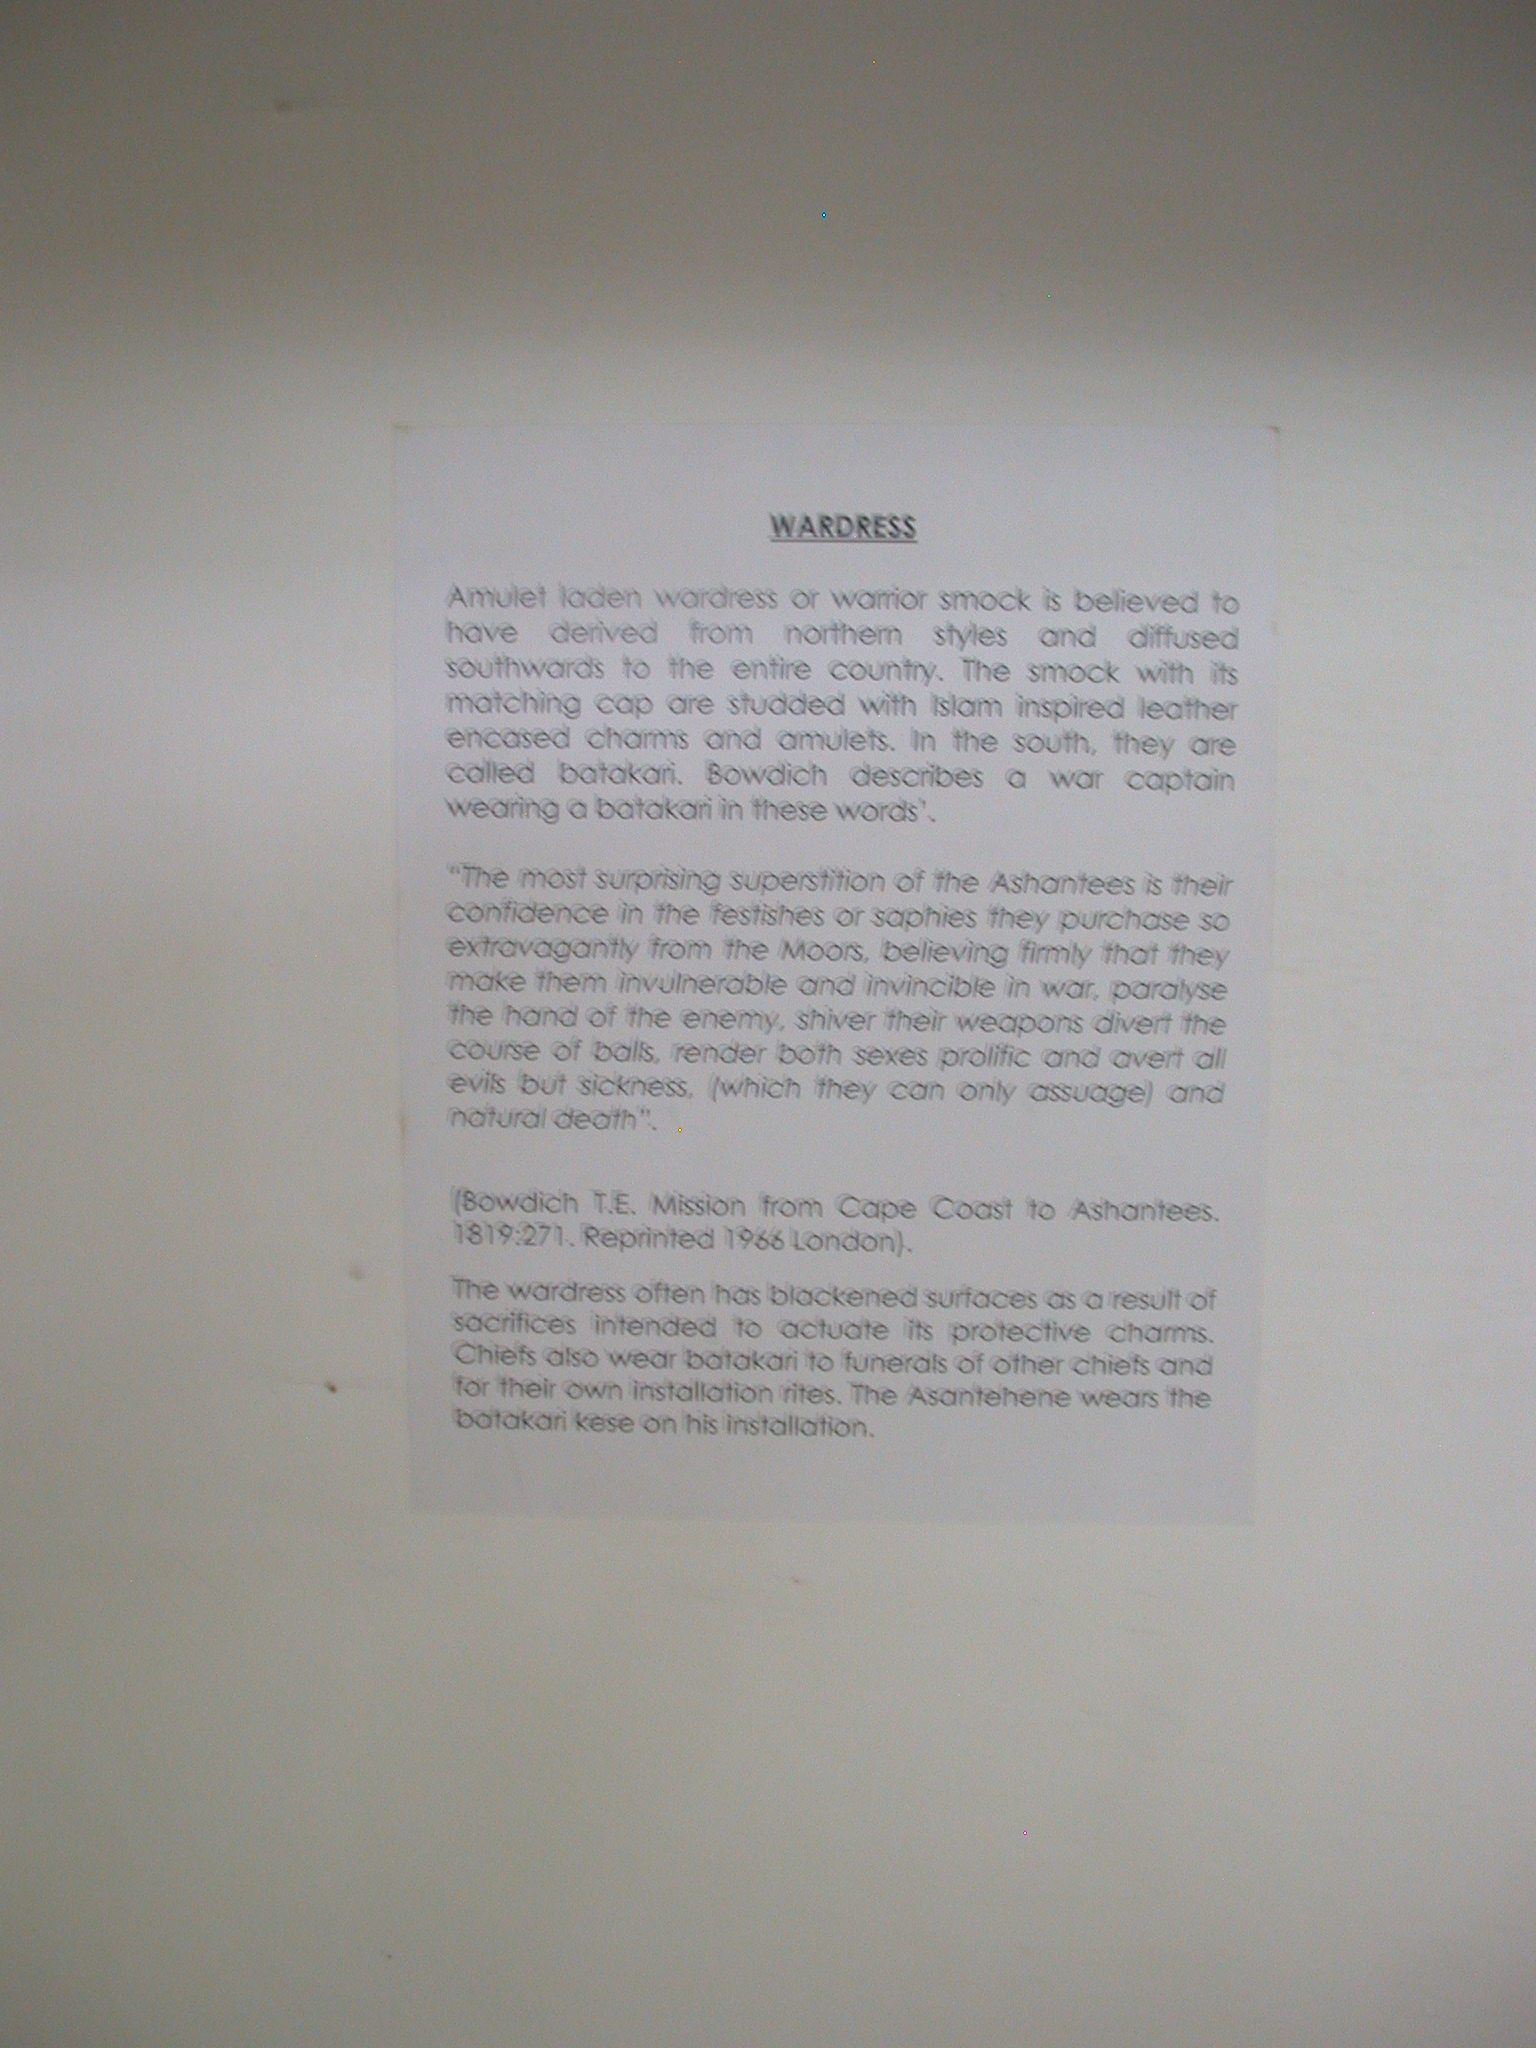 Wardress Description, National Museum, Accra, Ghana